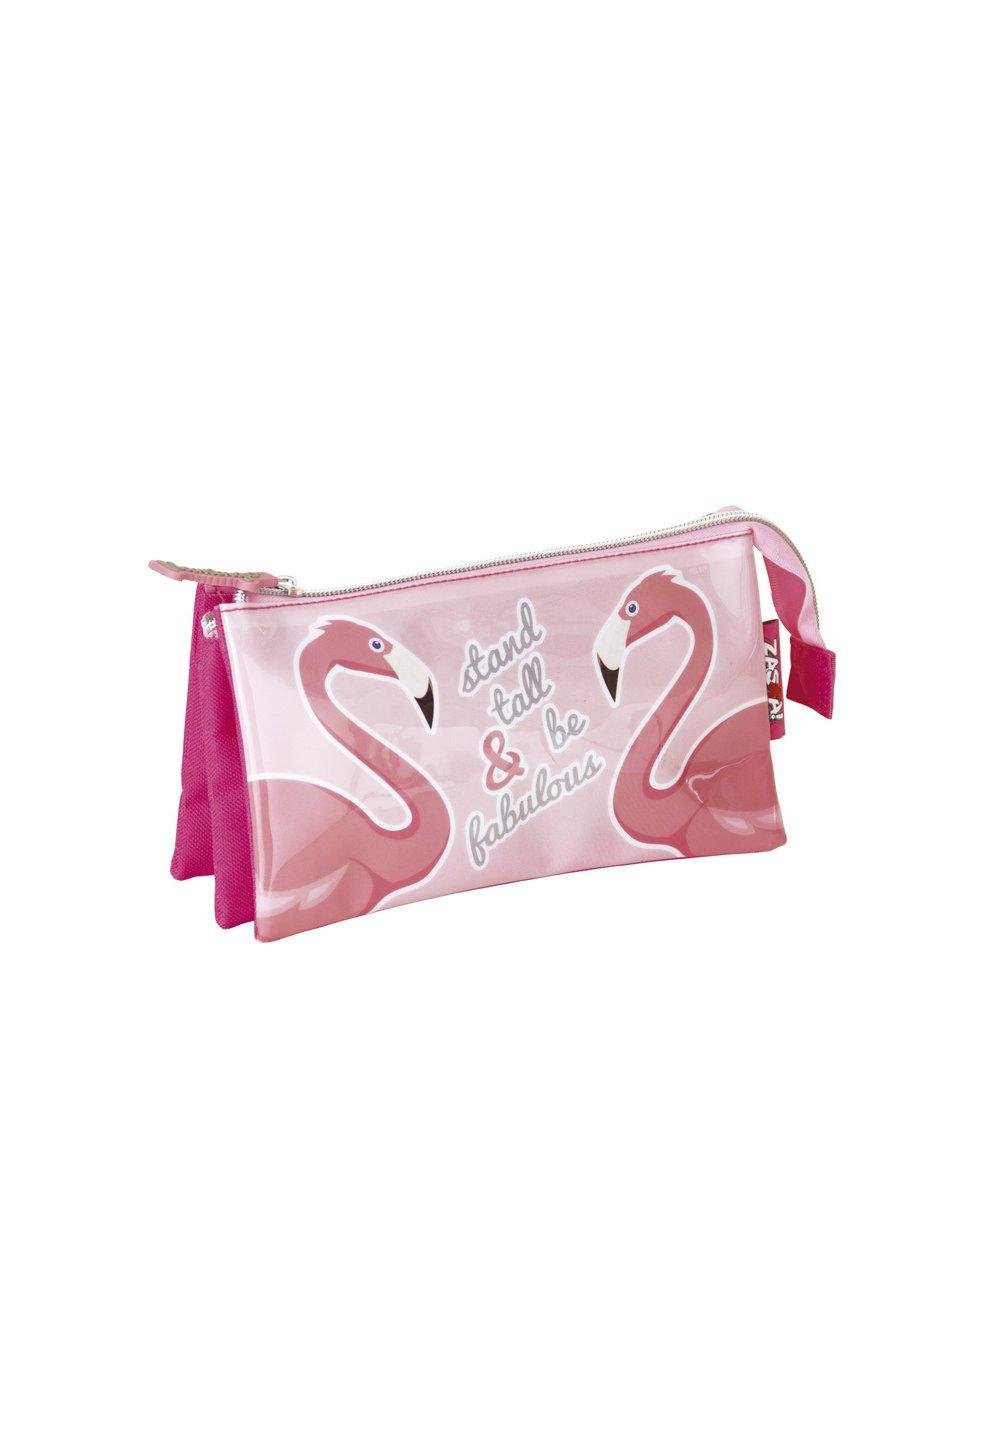 Portfard, Flamingo, roz imagine